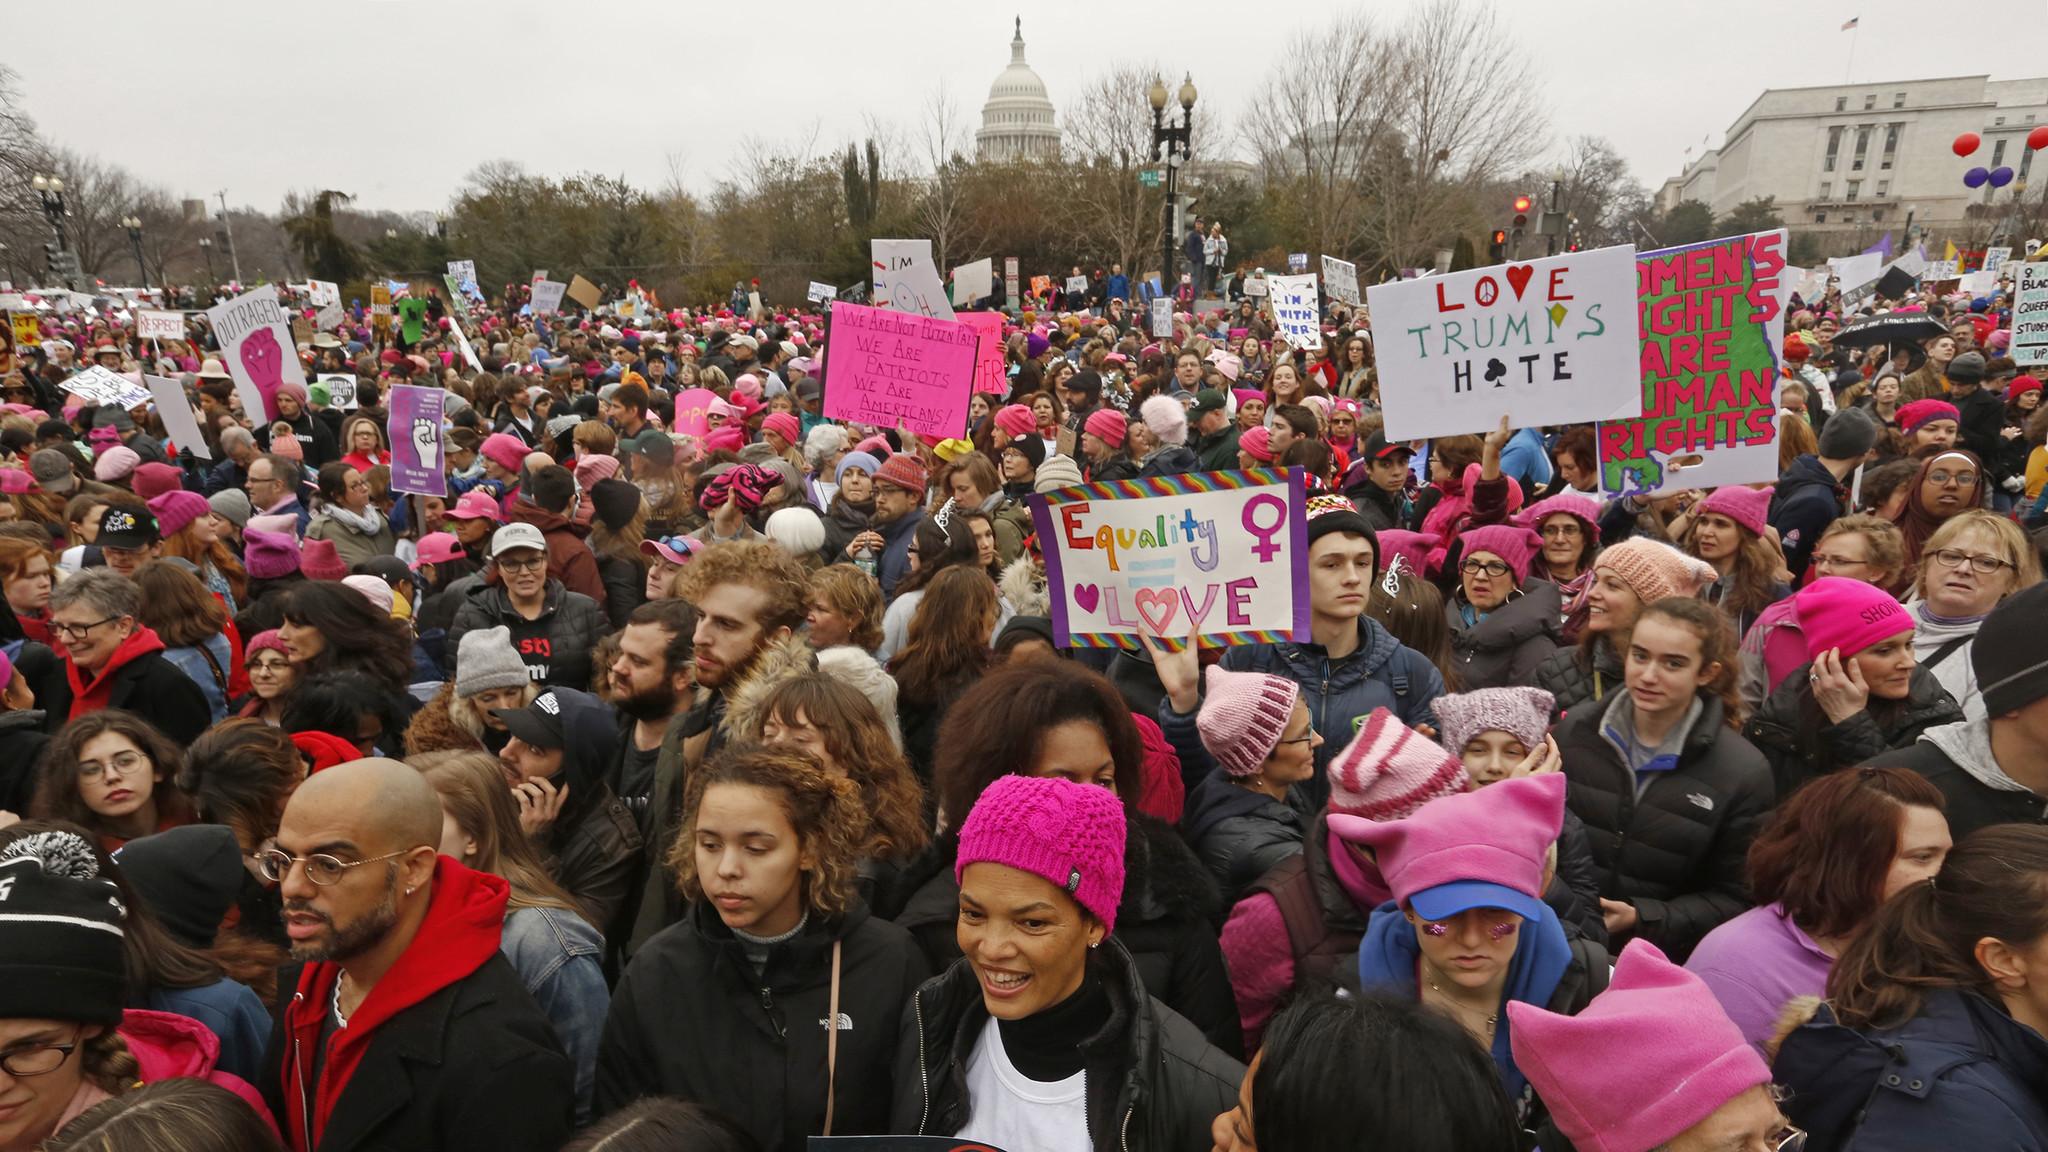 (Carolyn Cole / Los Angeles Times)